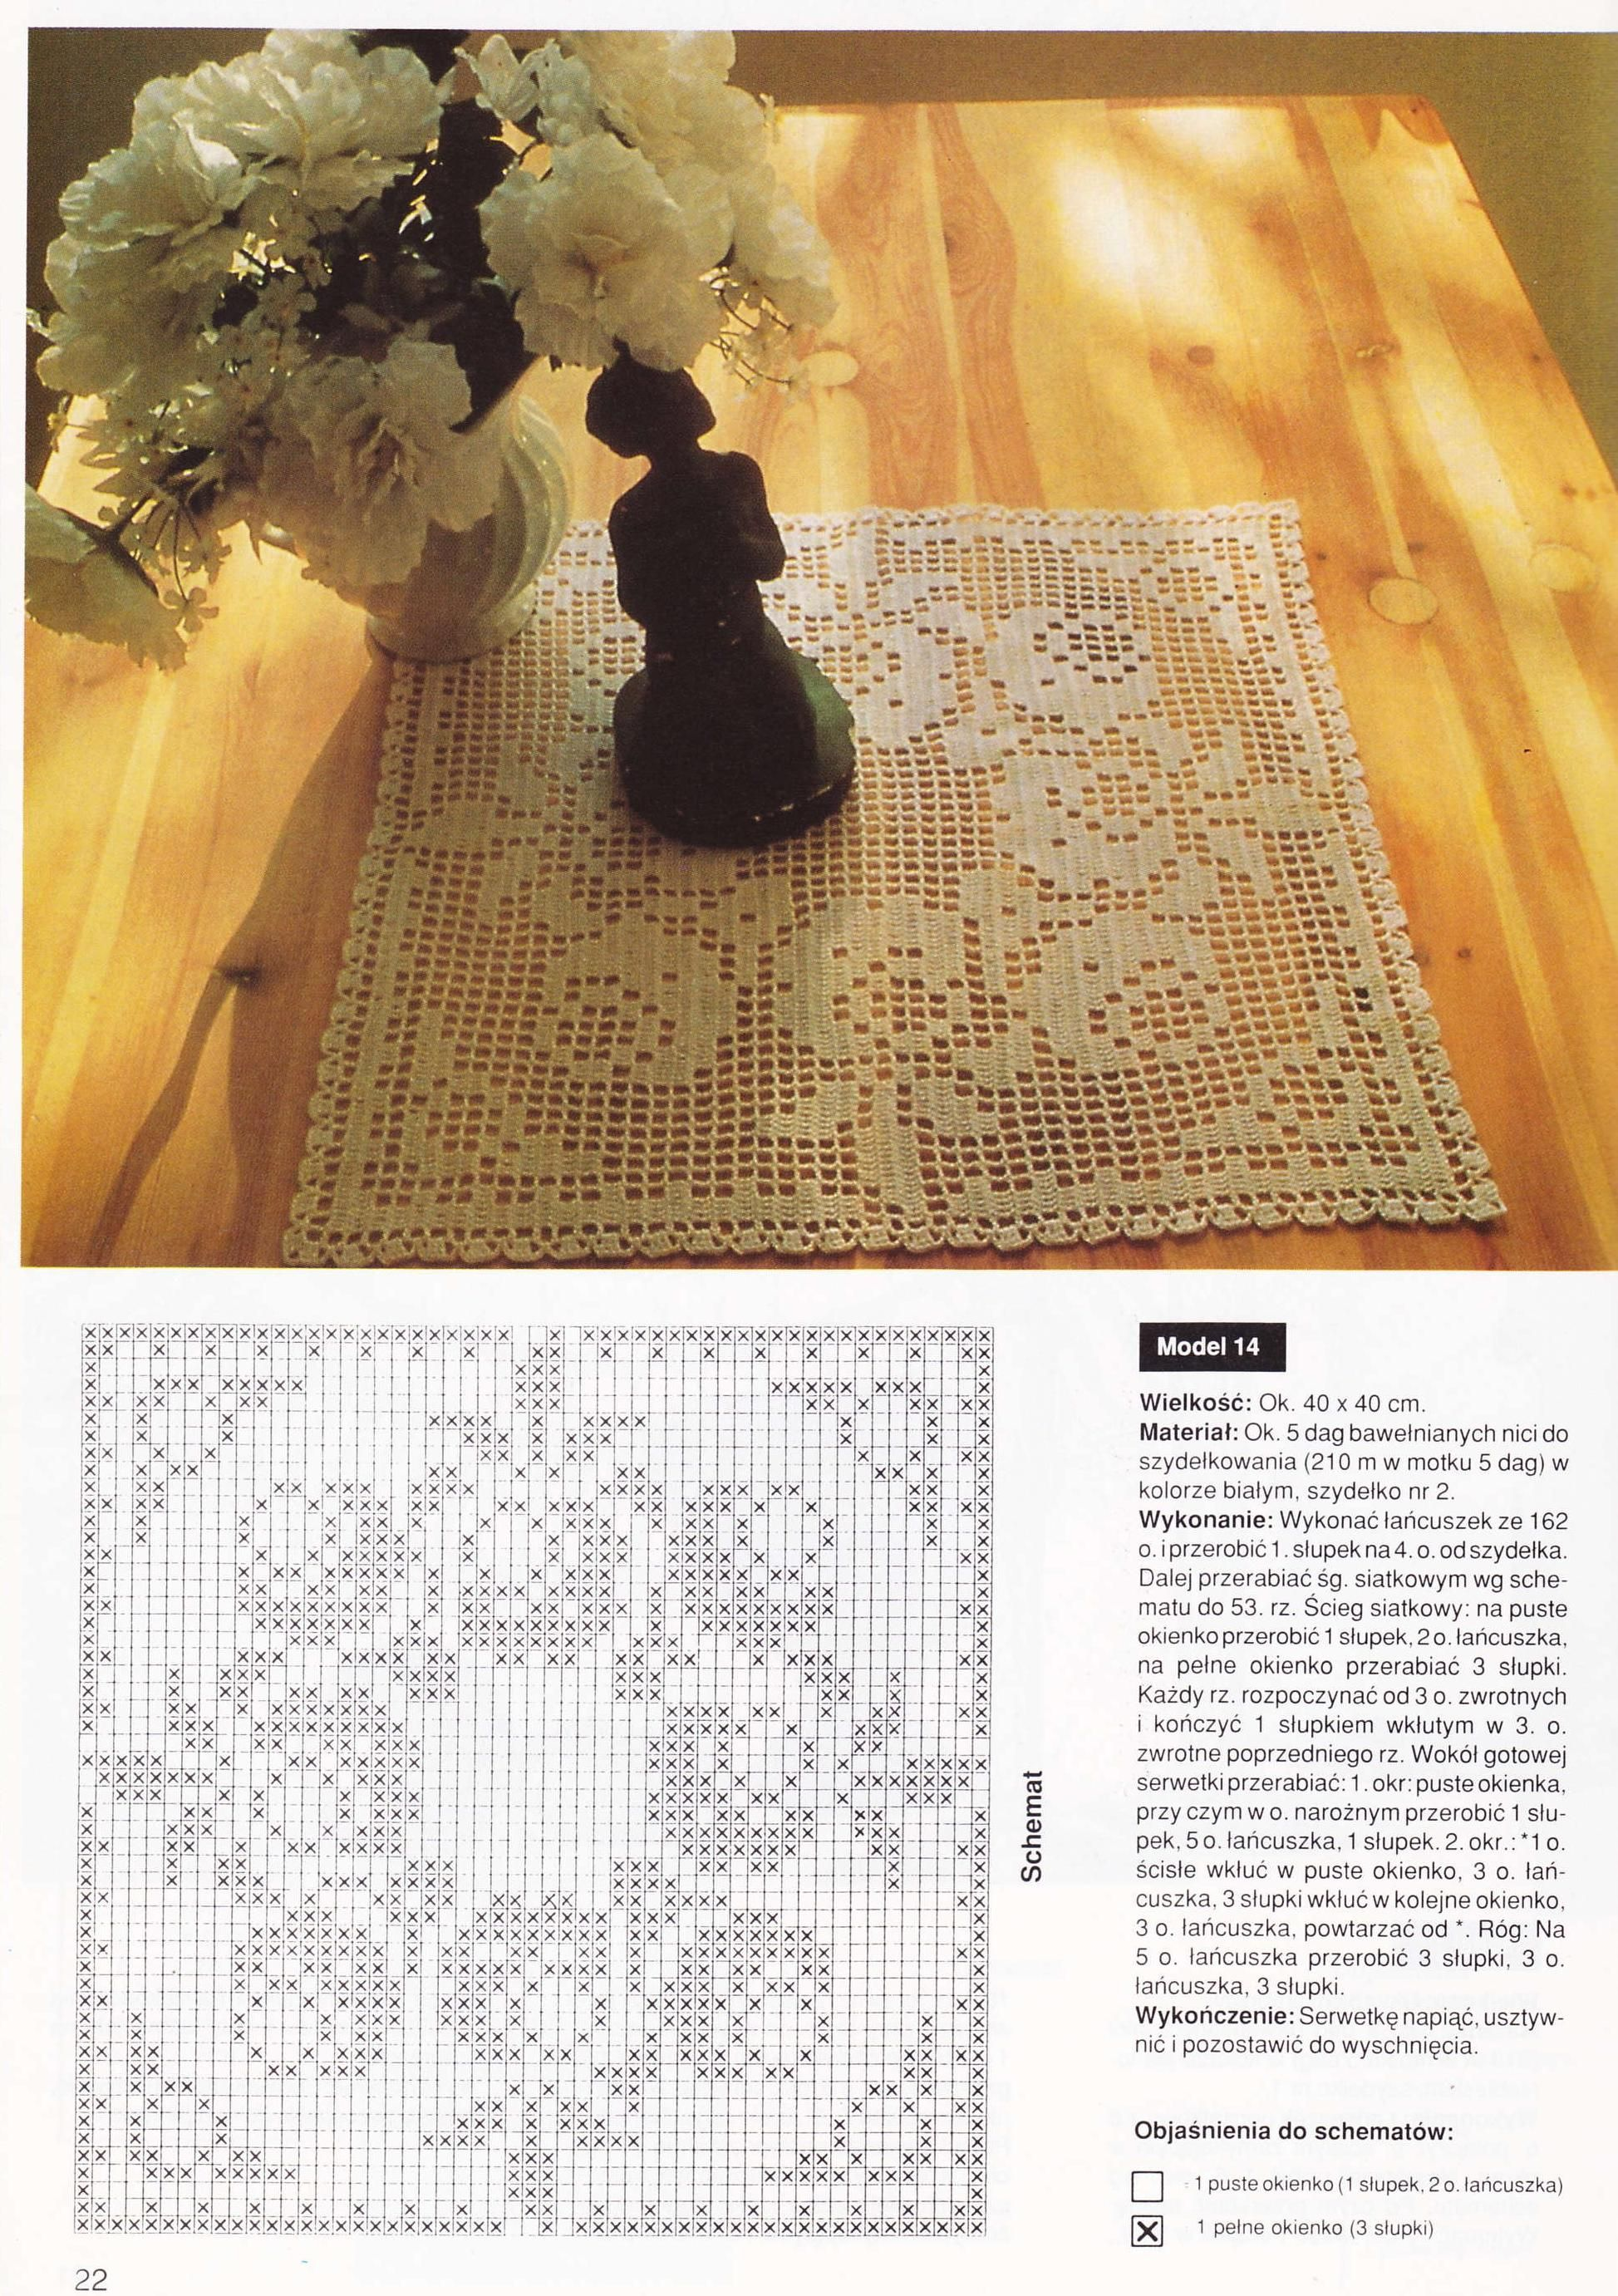 Deckchen Eckig Rosen Häkeln Crochet Crochetédiverses